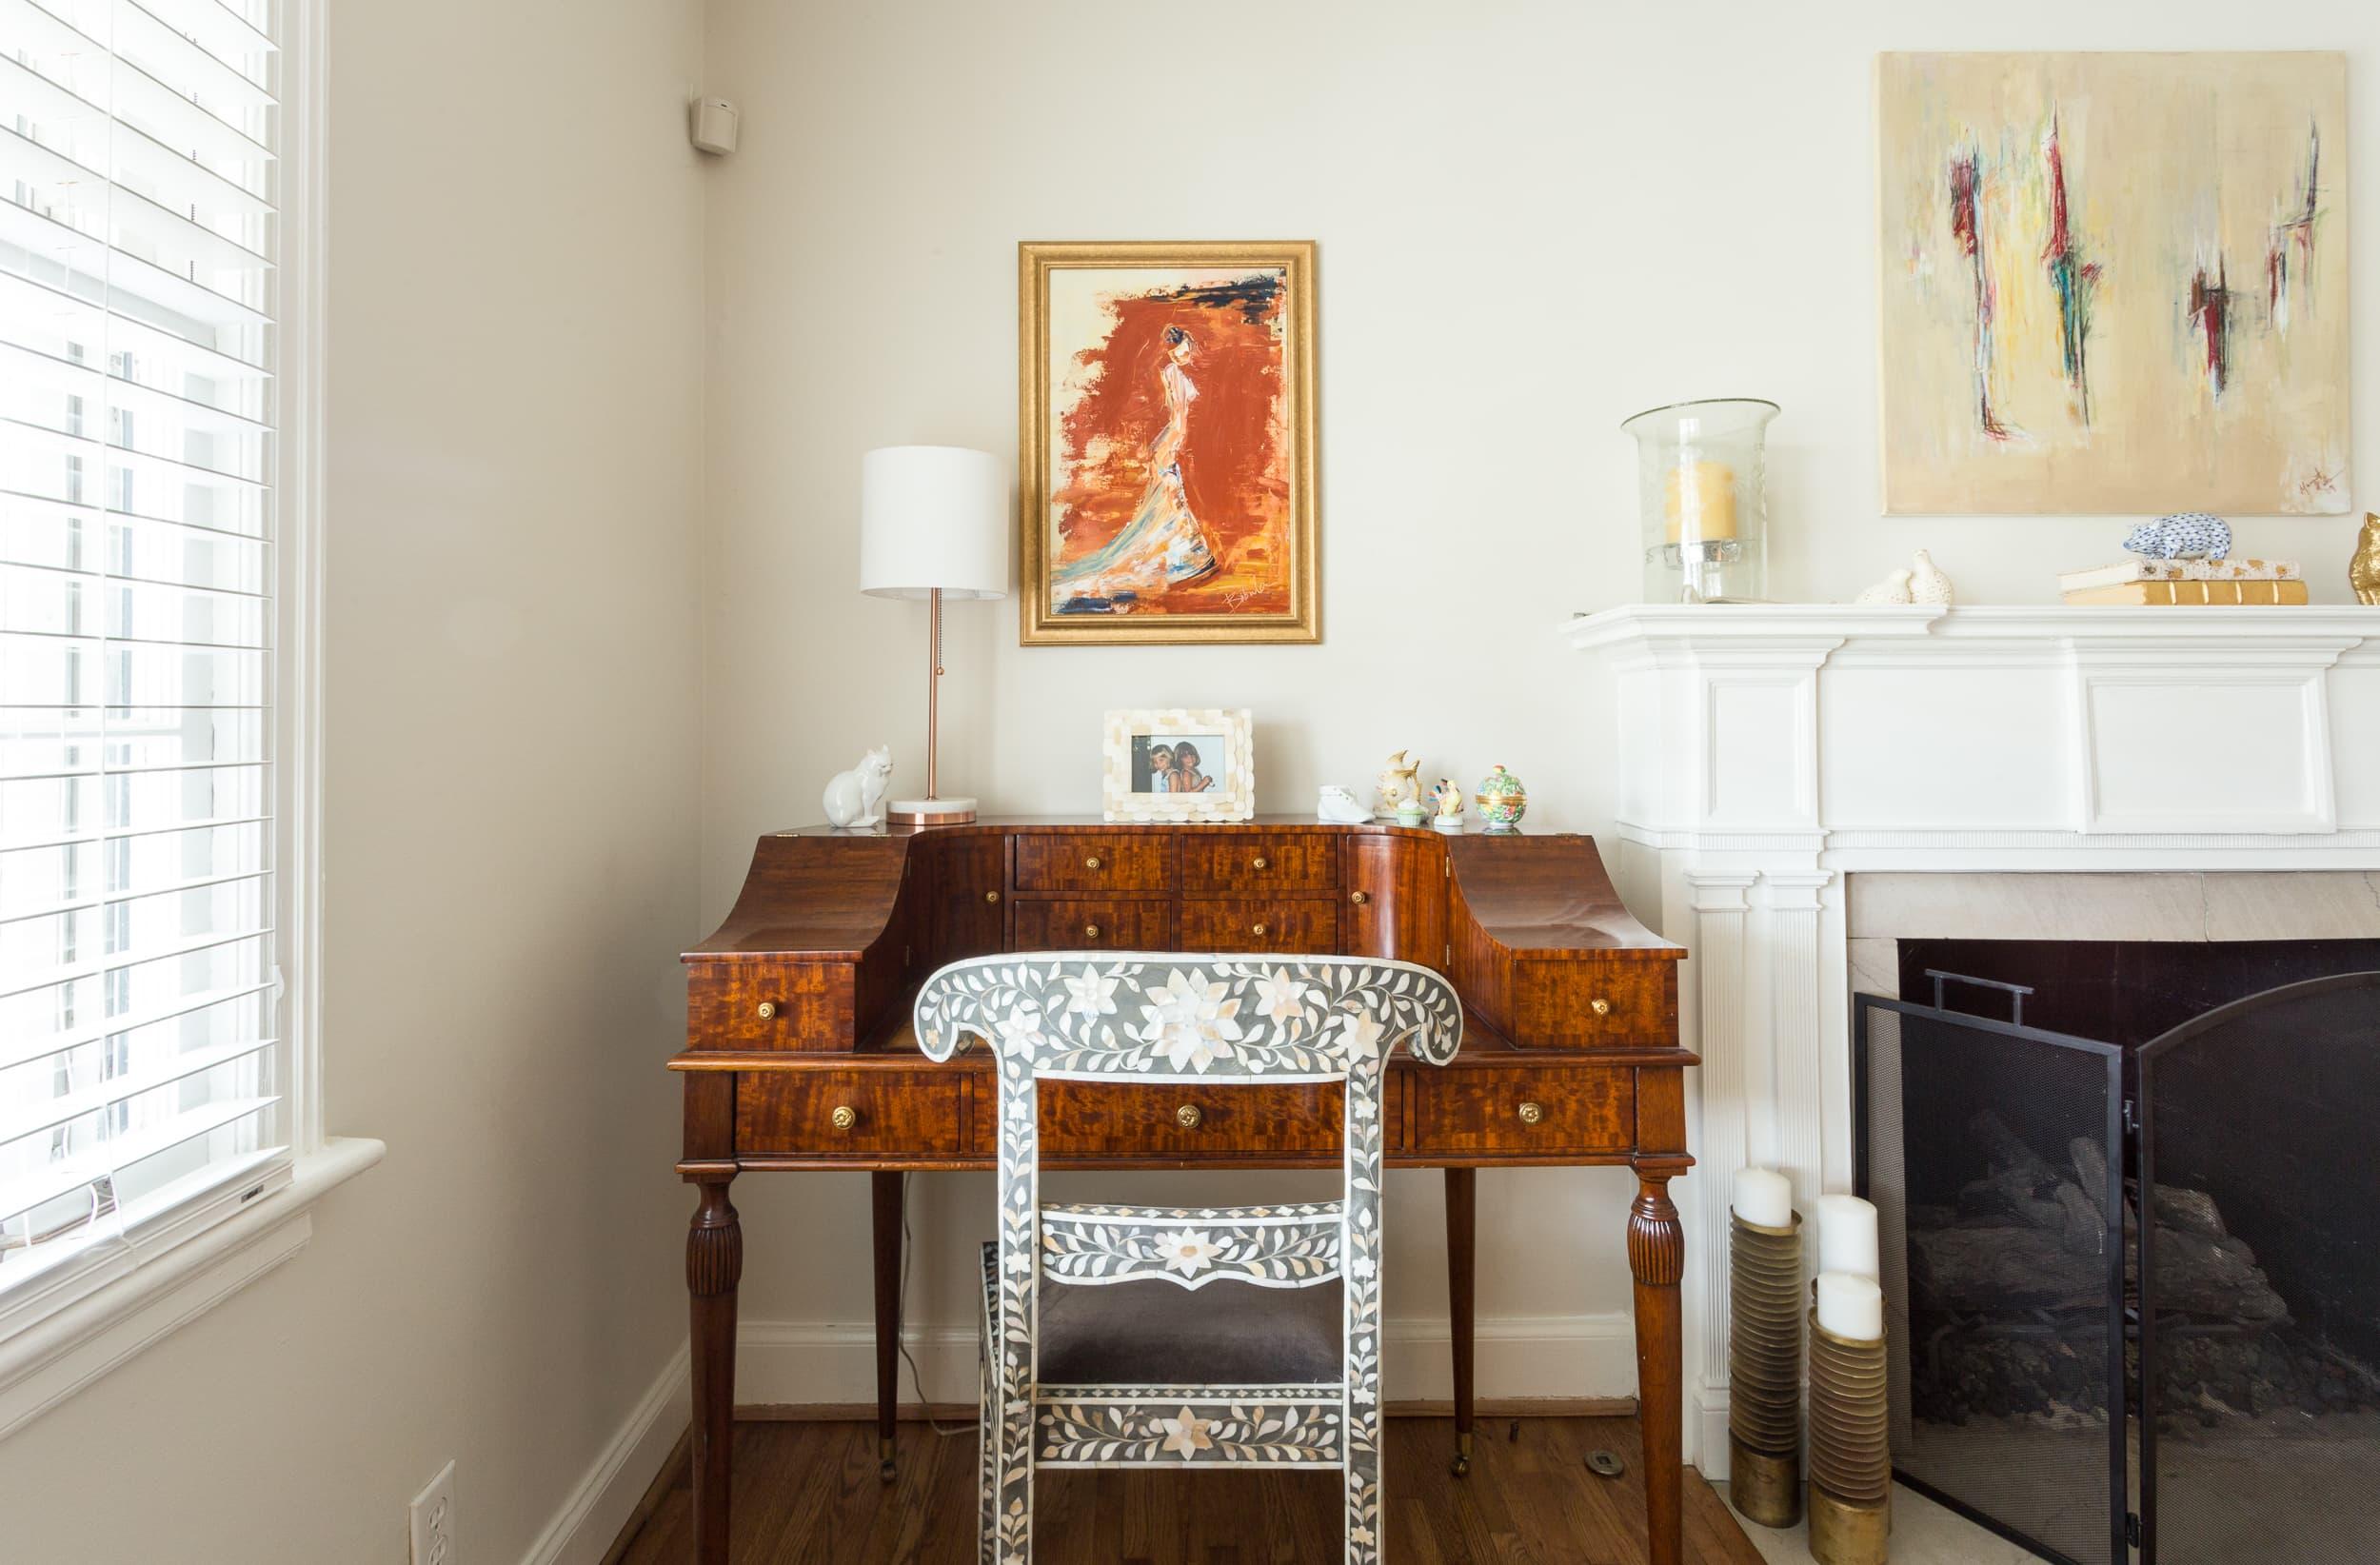 House Tour: A Modern Rustic Boho Chic Nashville Home ...